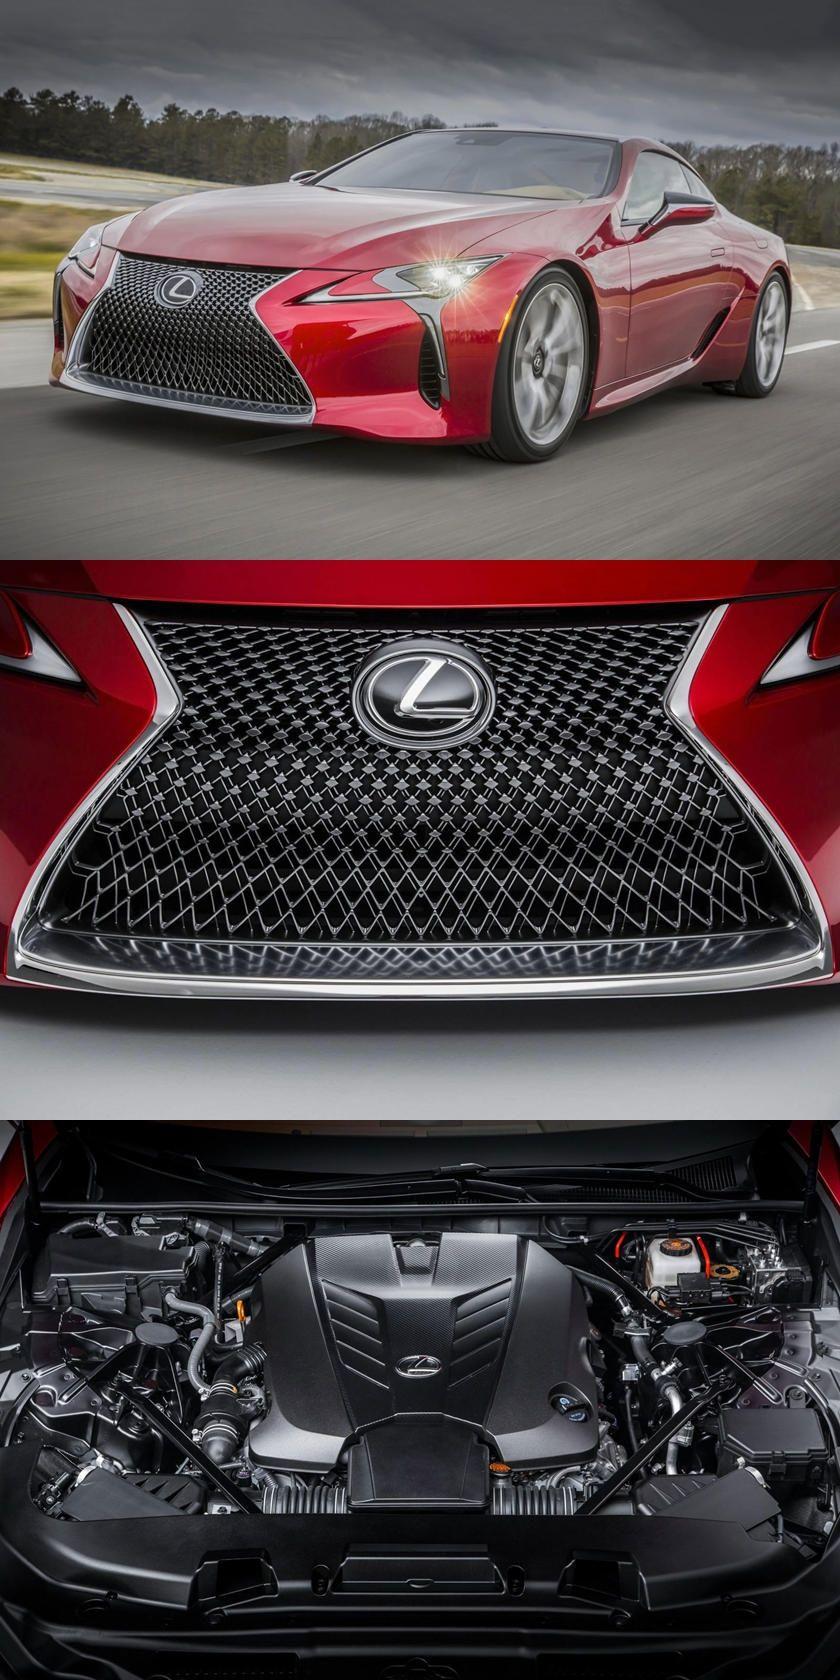 Lexus Lc F Will Be As Powerful As Ferrari 488 Gtb In 2020 Lexus Lc